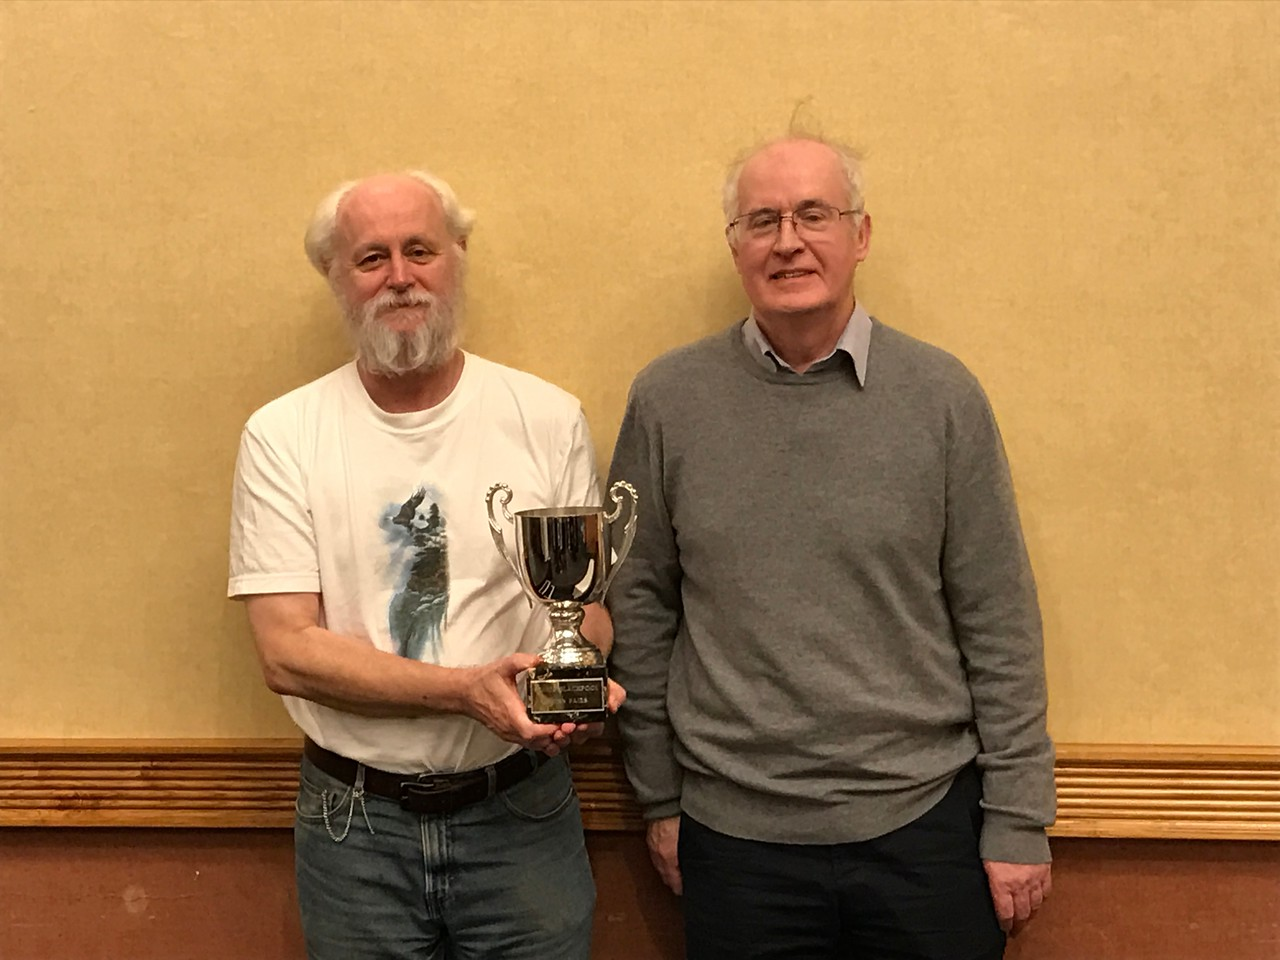 Blackpool Year End Congress 2016 - Swiss Pairs winners - Alan Mould & John Holland